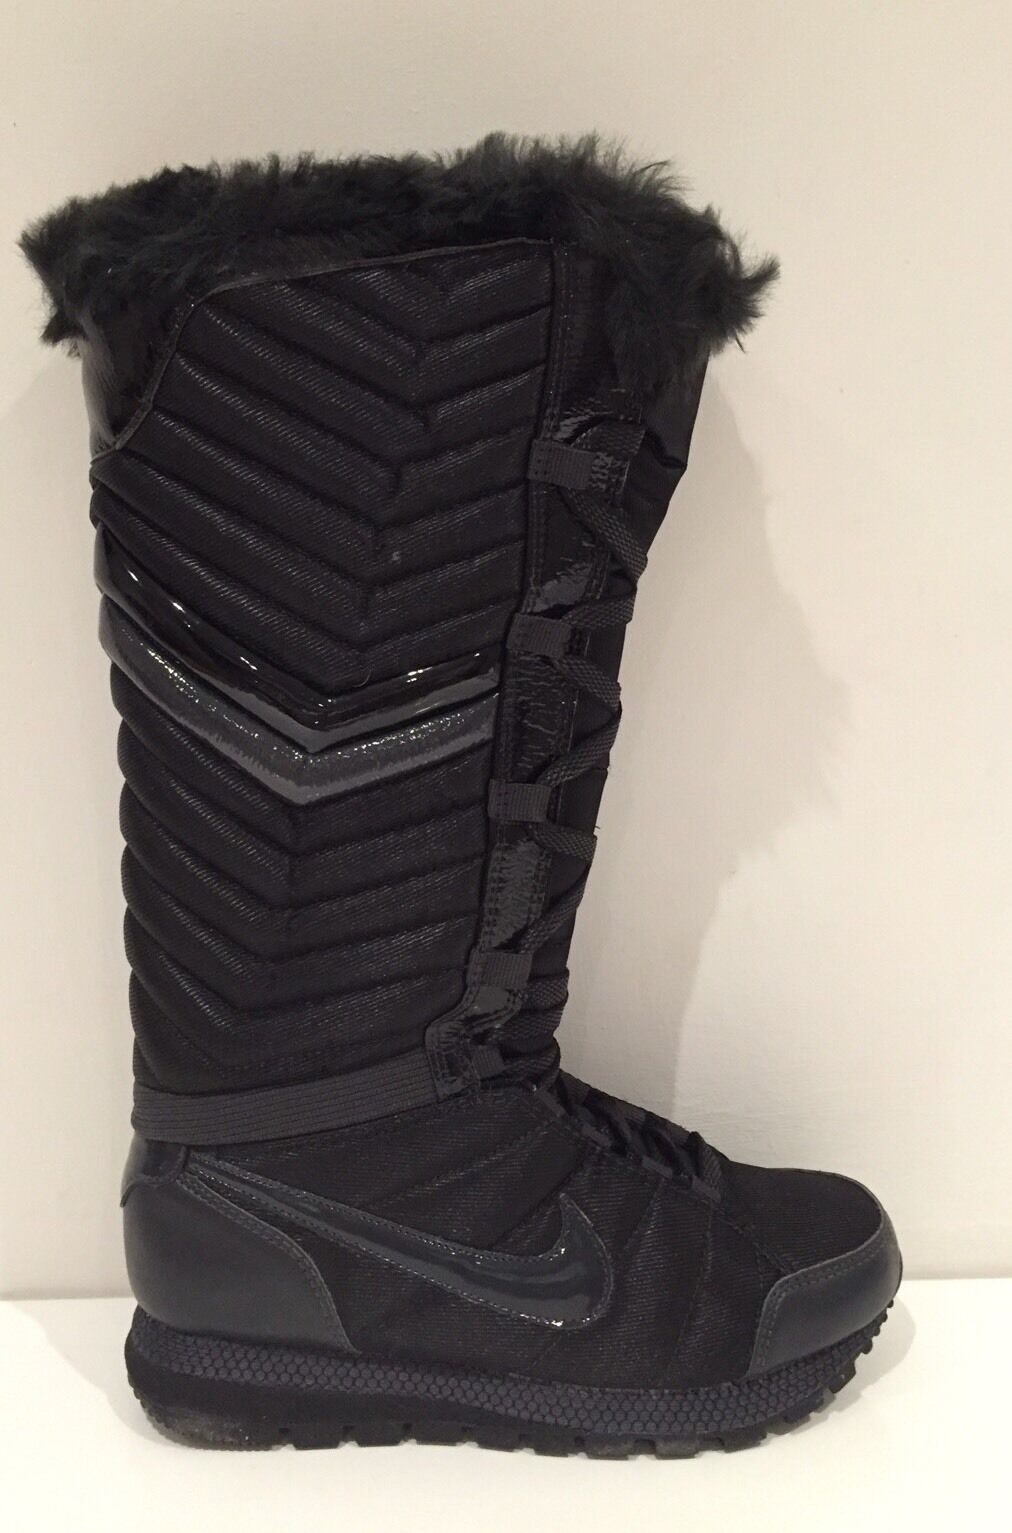 Nike Apres Ski High Größe 2.5 (uk) BNIB